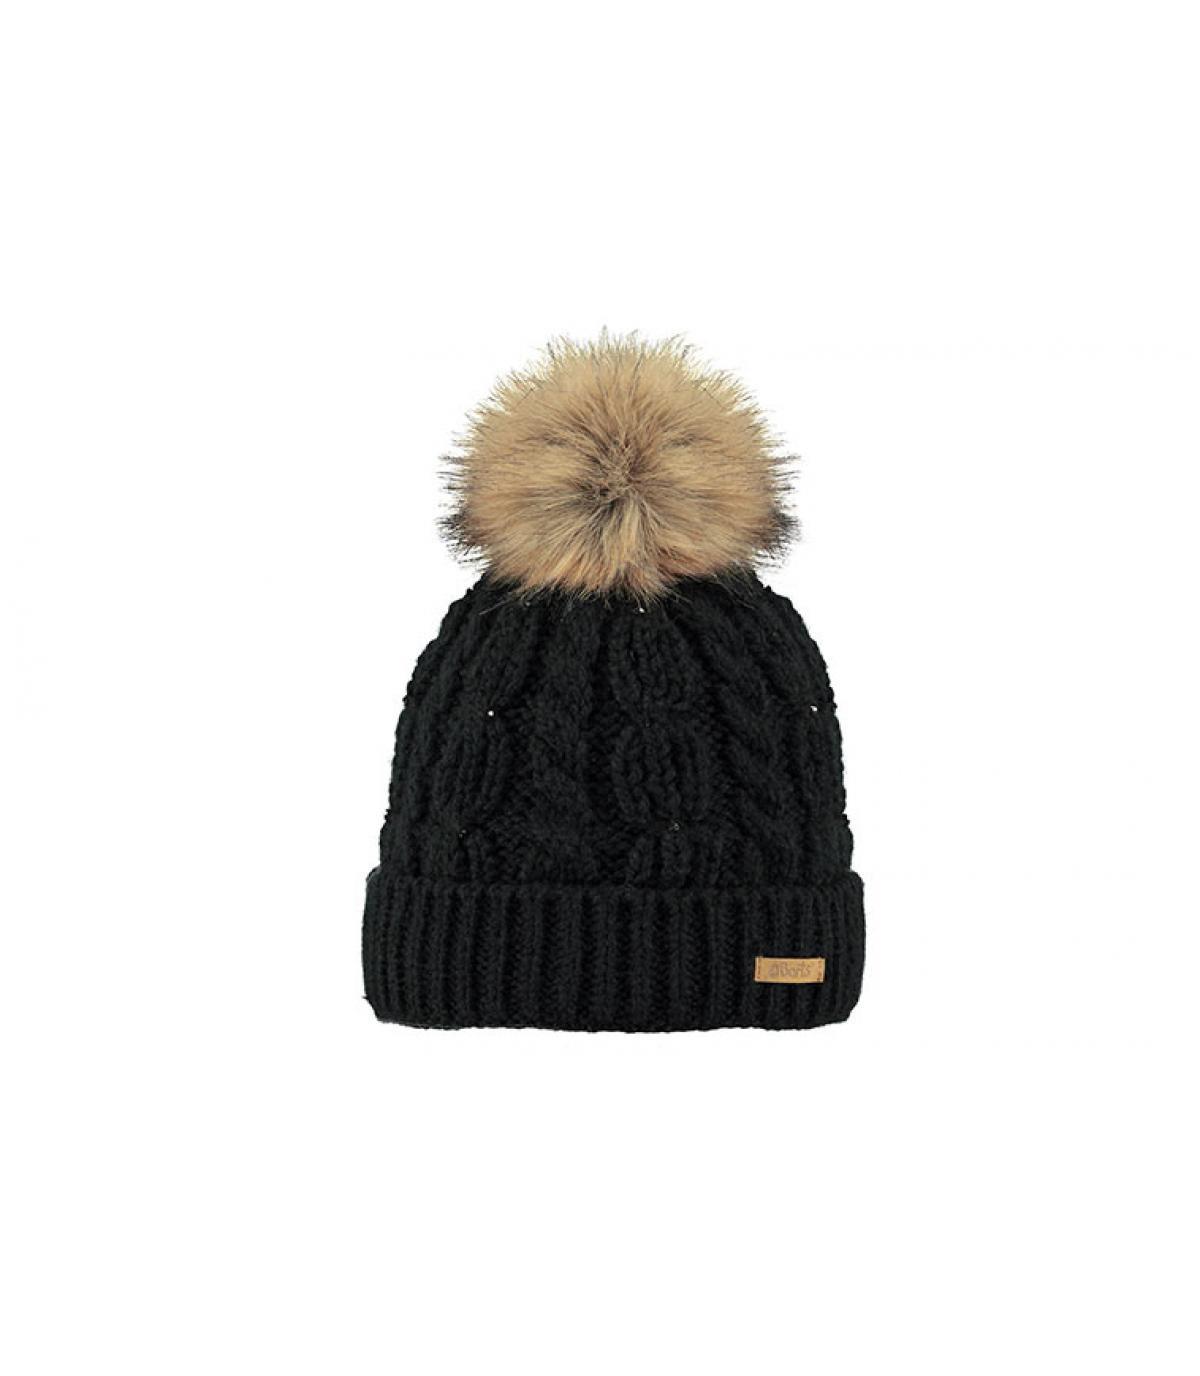 da990b2668f ... bonnet torsade noir fille - Lux Beanie Girls black Barts - image 2 ...